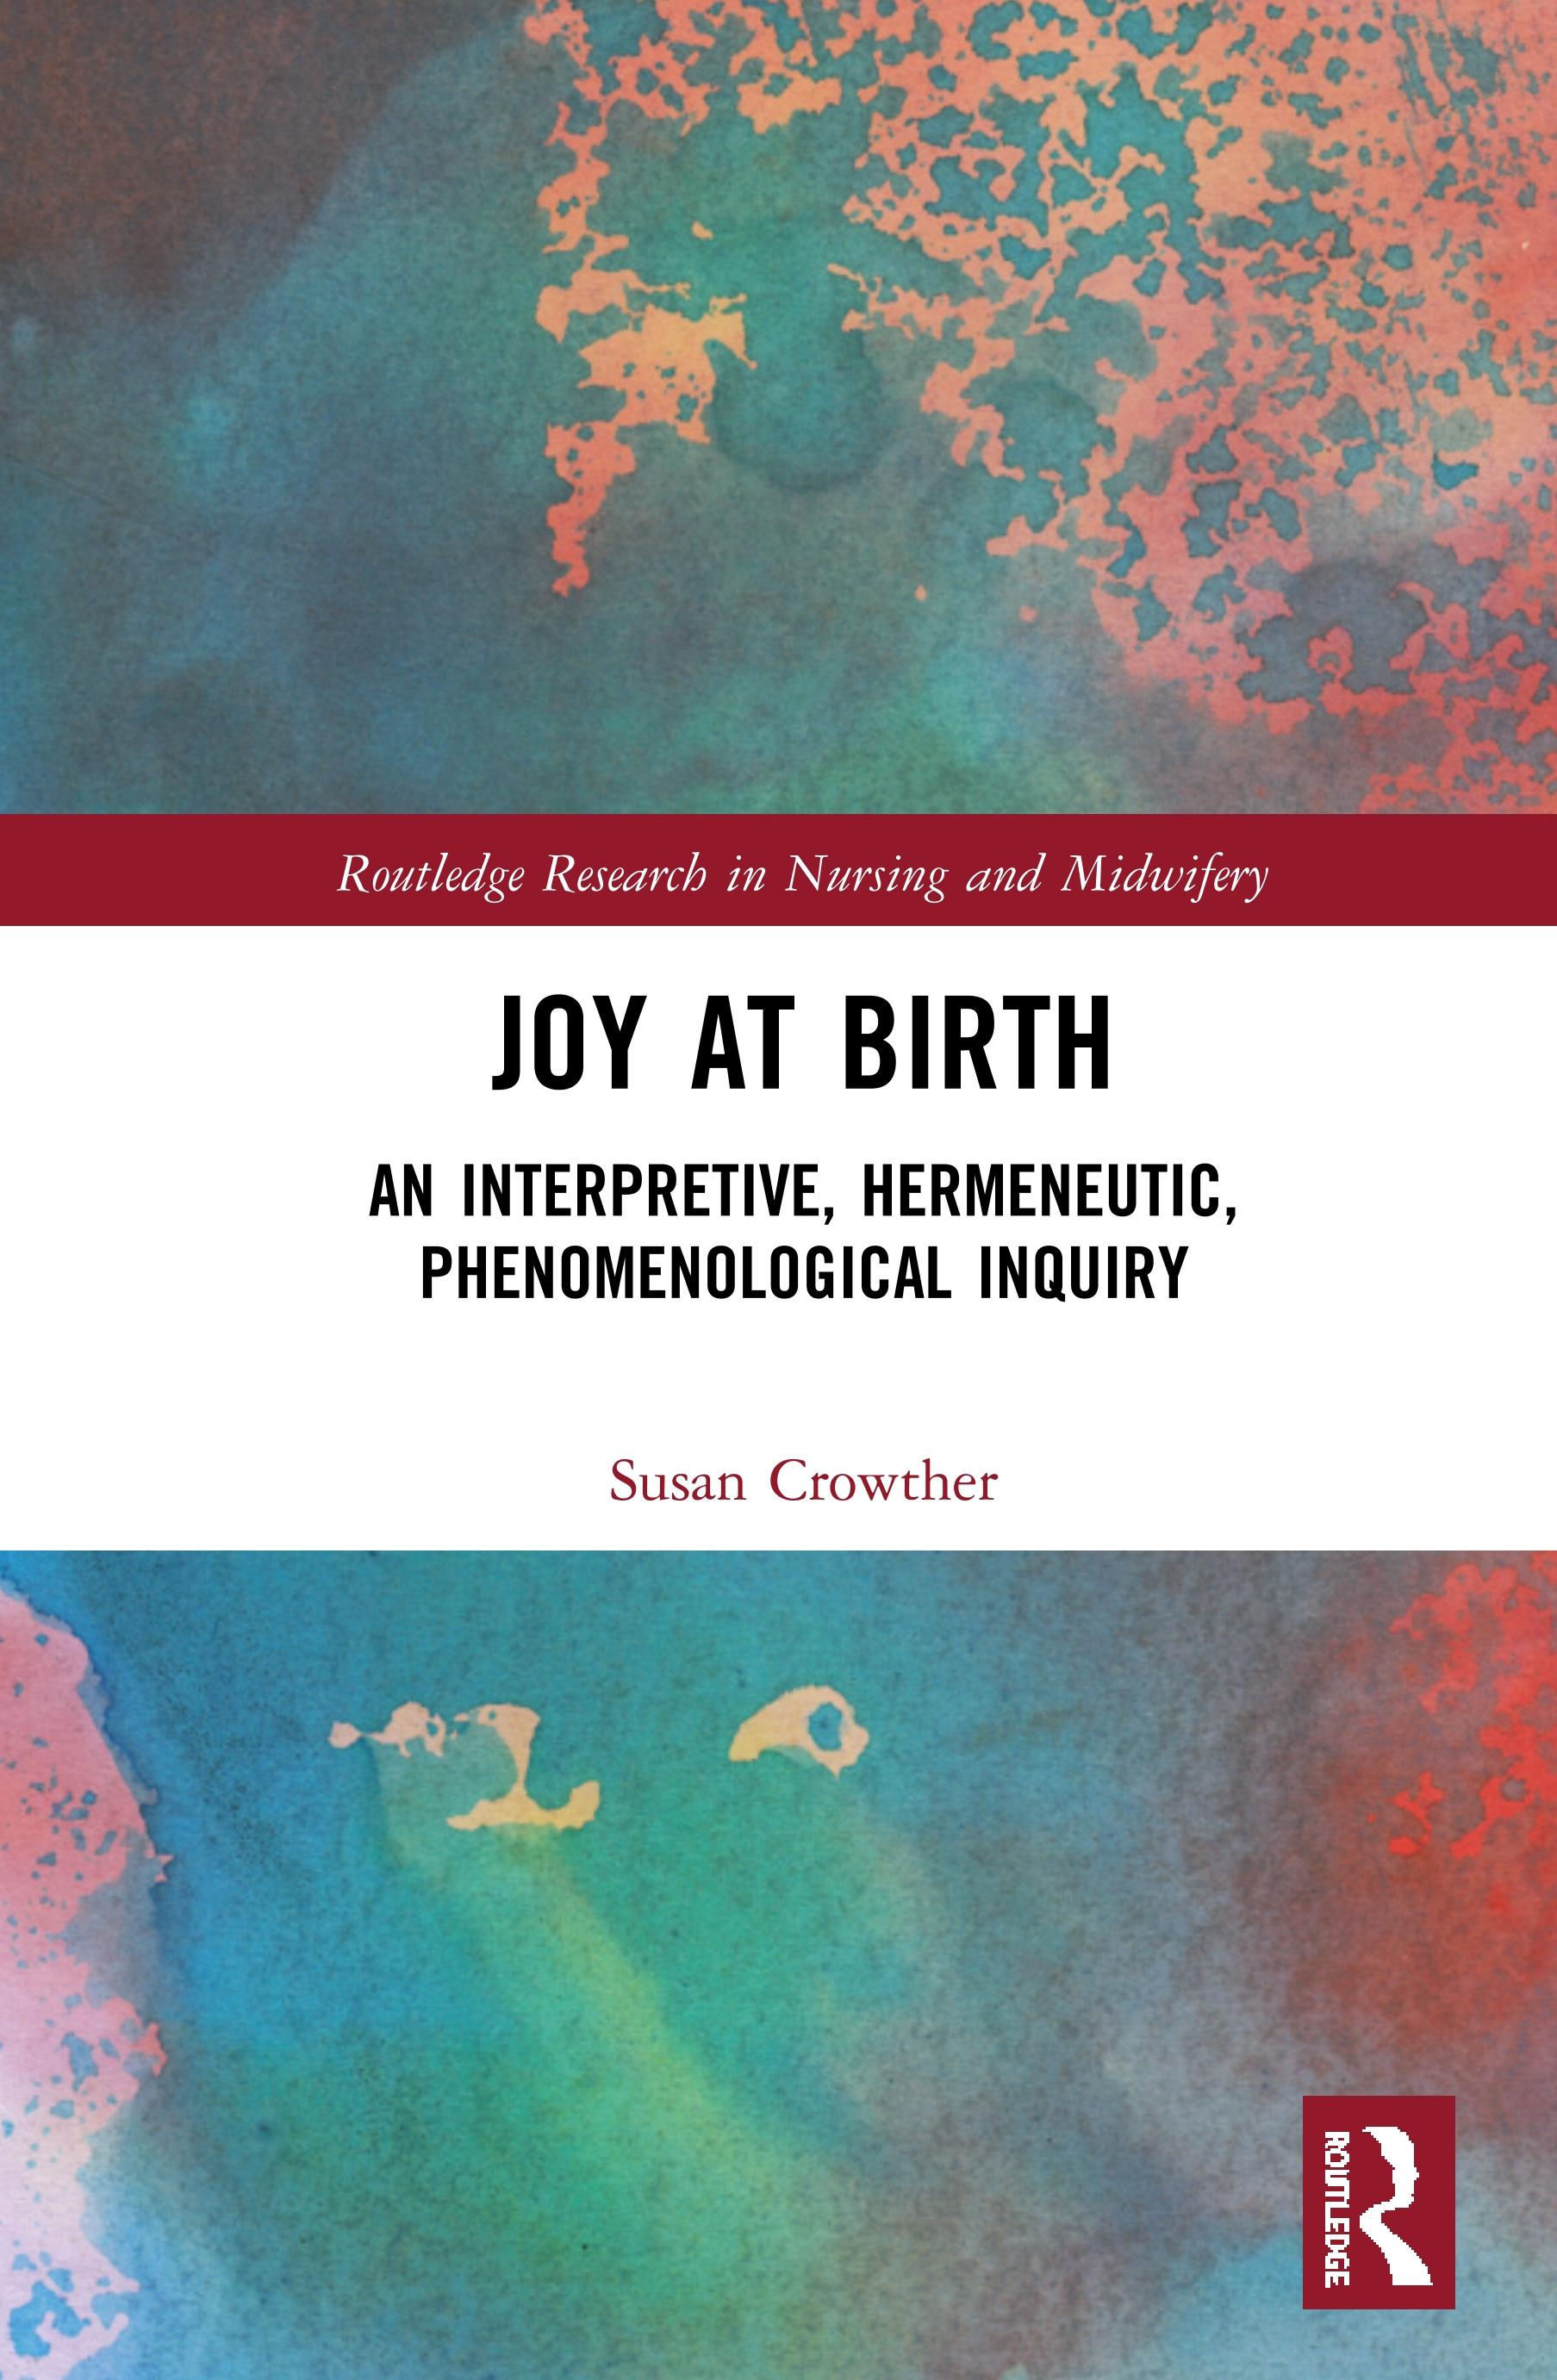 Joy at Birth: An Interpretive, Hermeneutic, Phenomenological Inquiry book cover